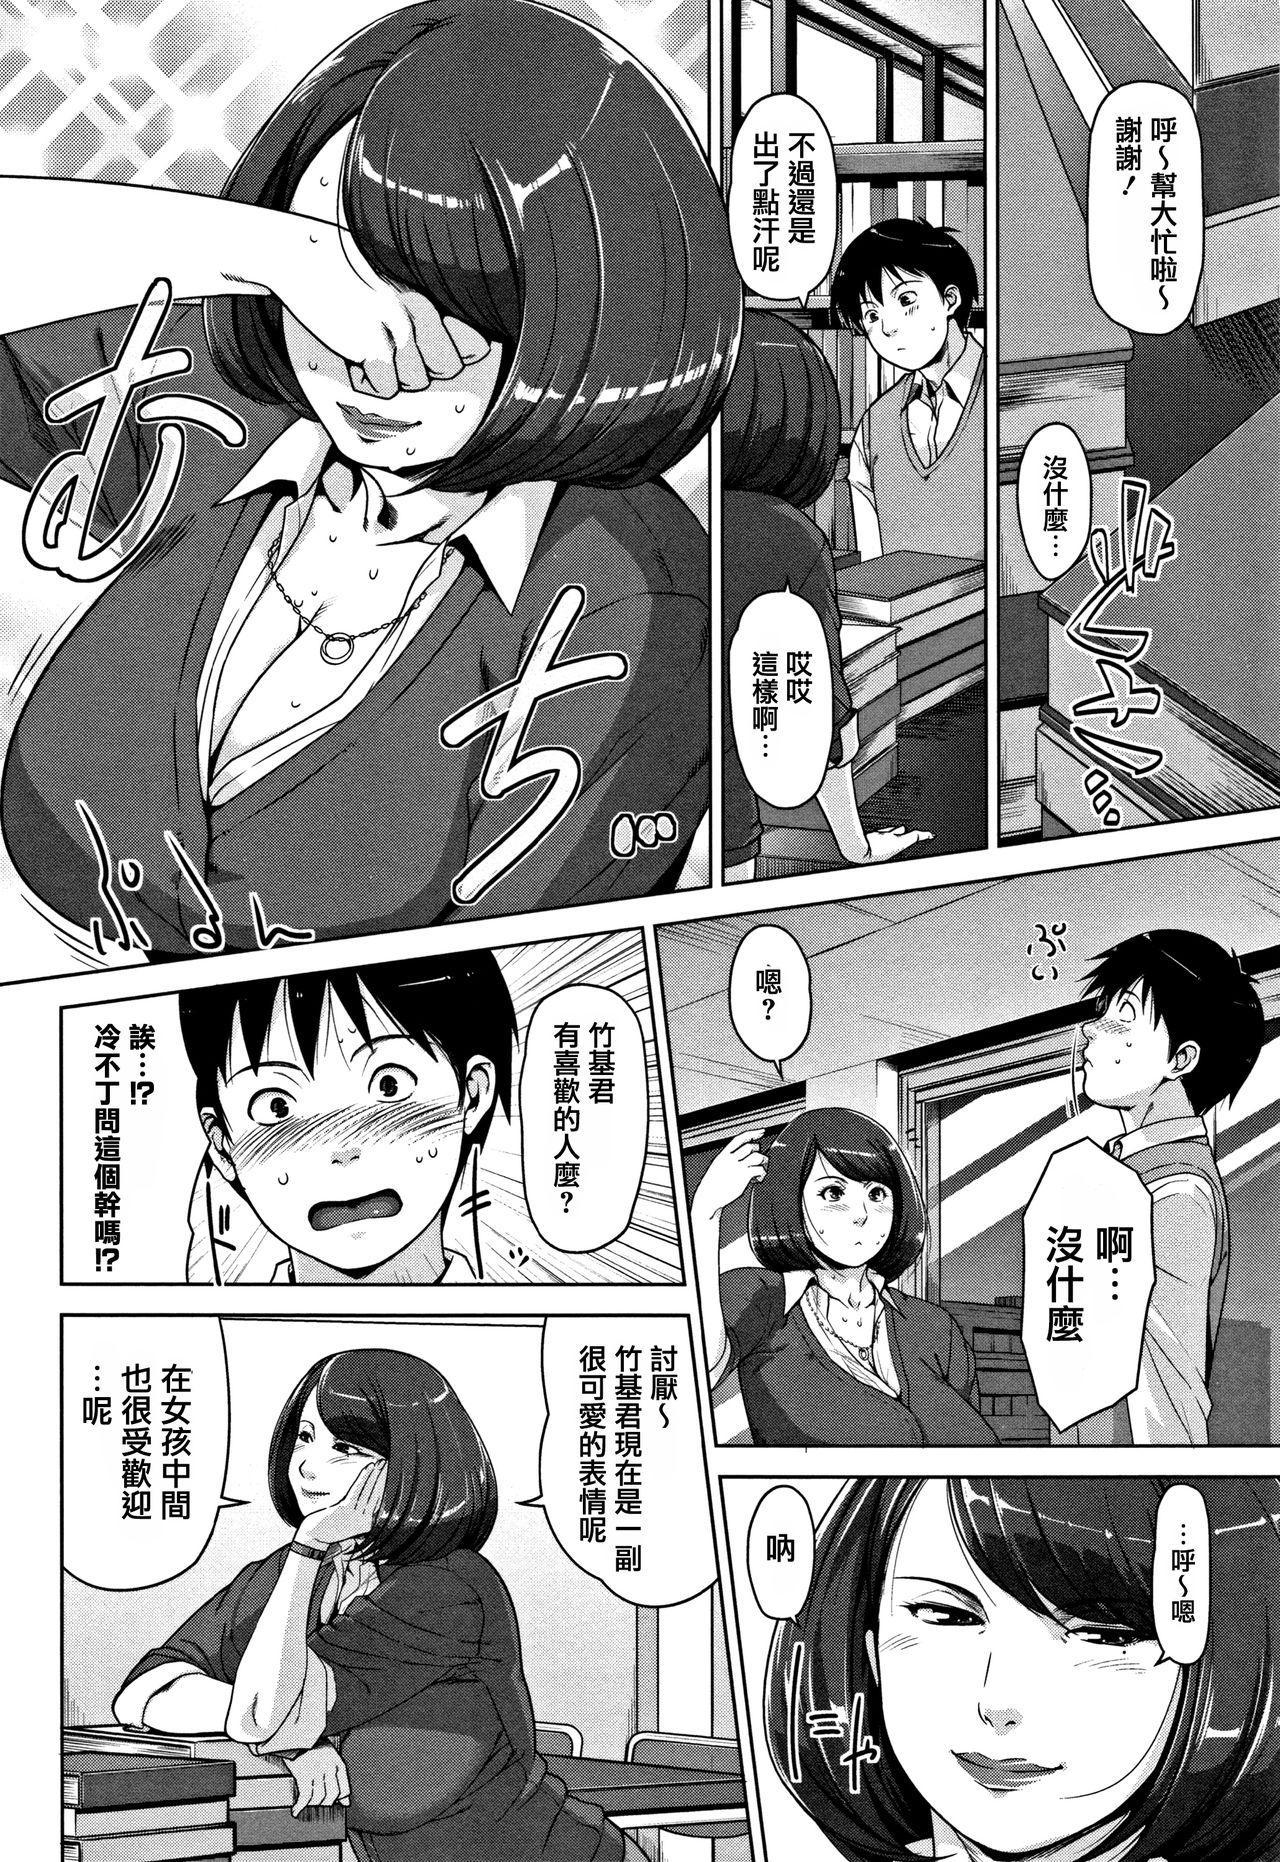 Kanjyuku Chijyo 141